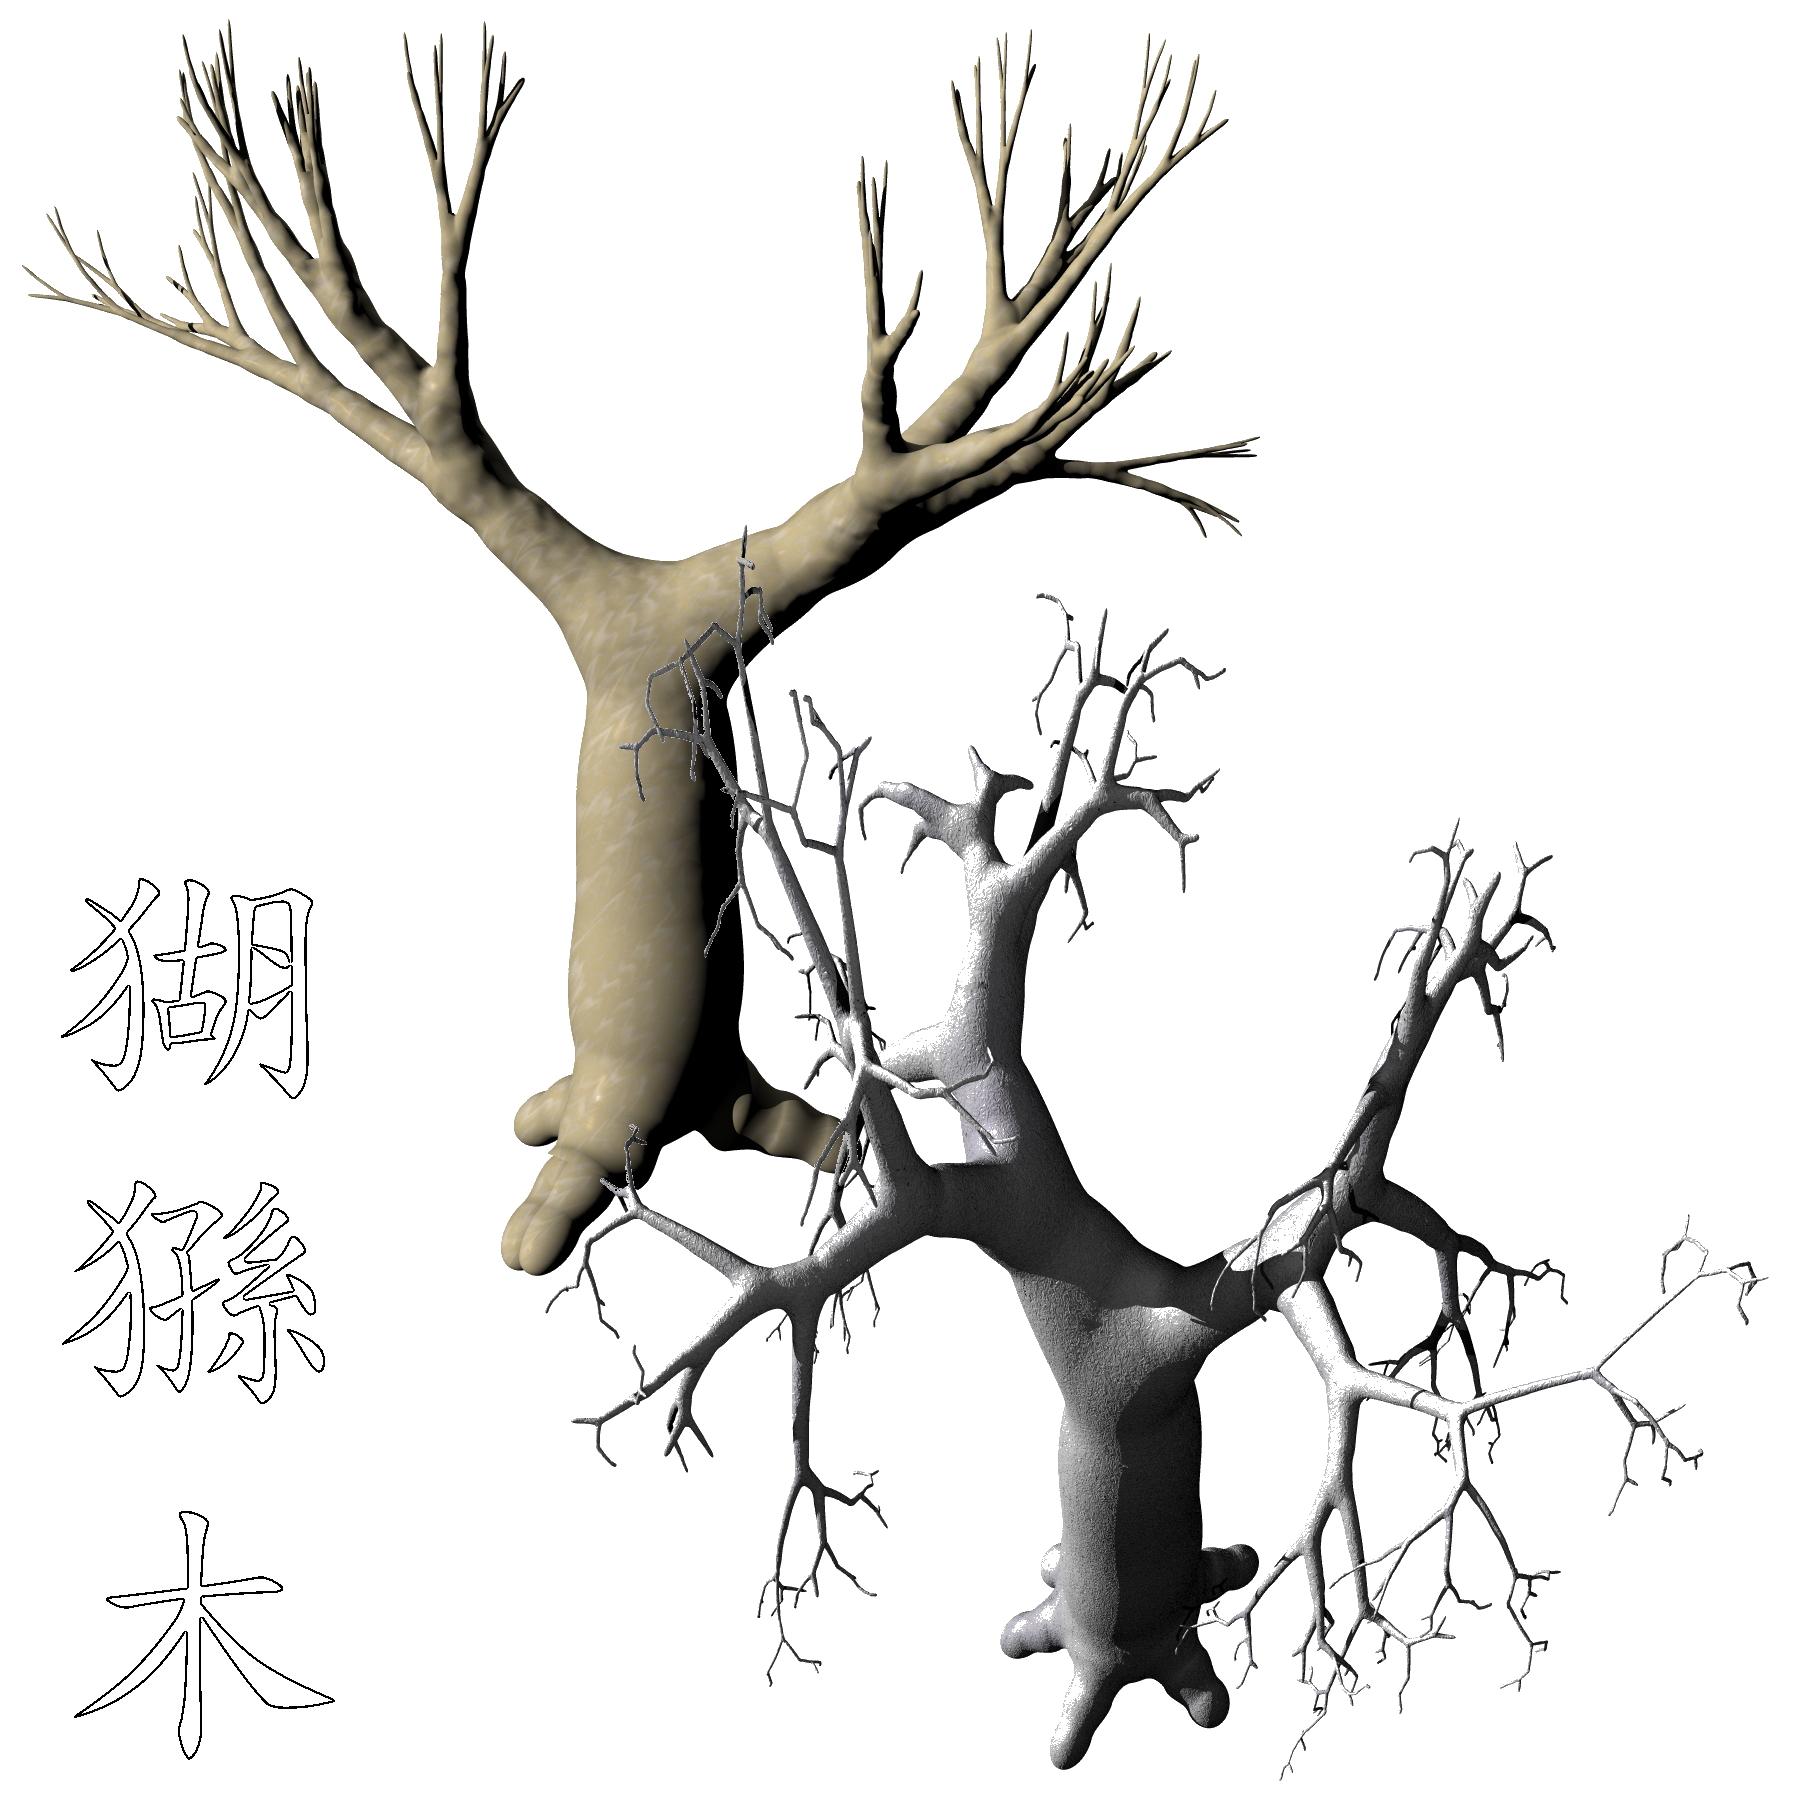 1800x1800 Dry Baobab Adansonia Tif png By Kanji Hanzi Centerrr